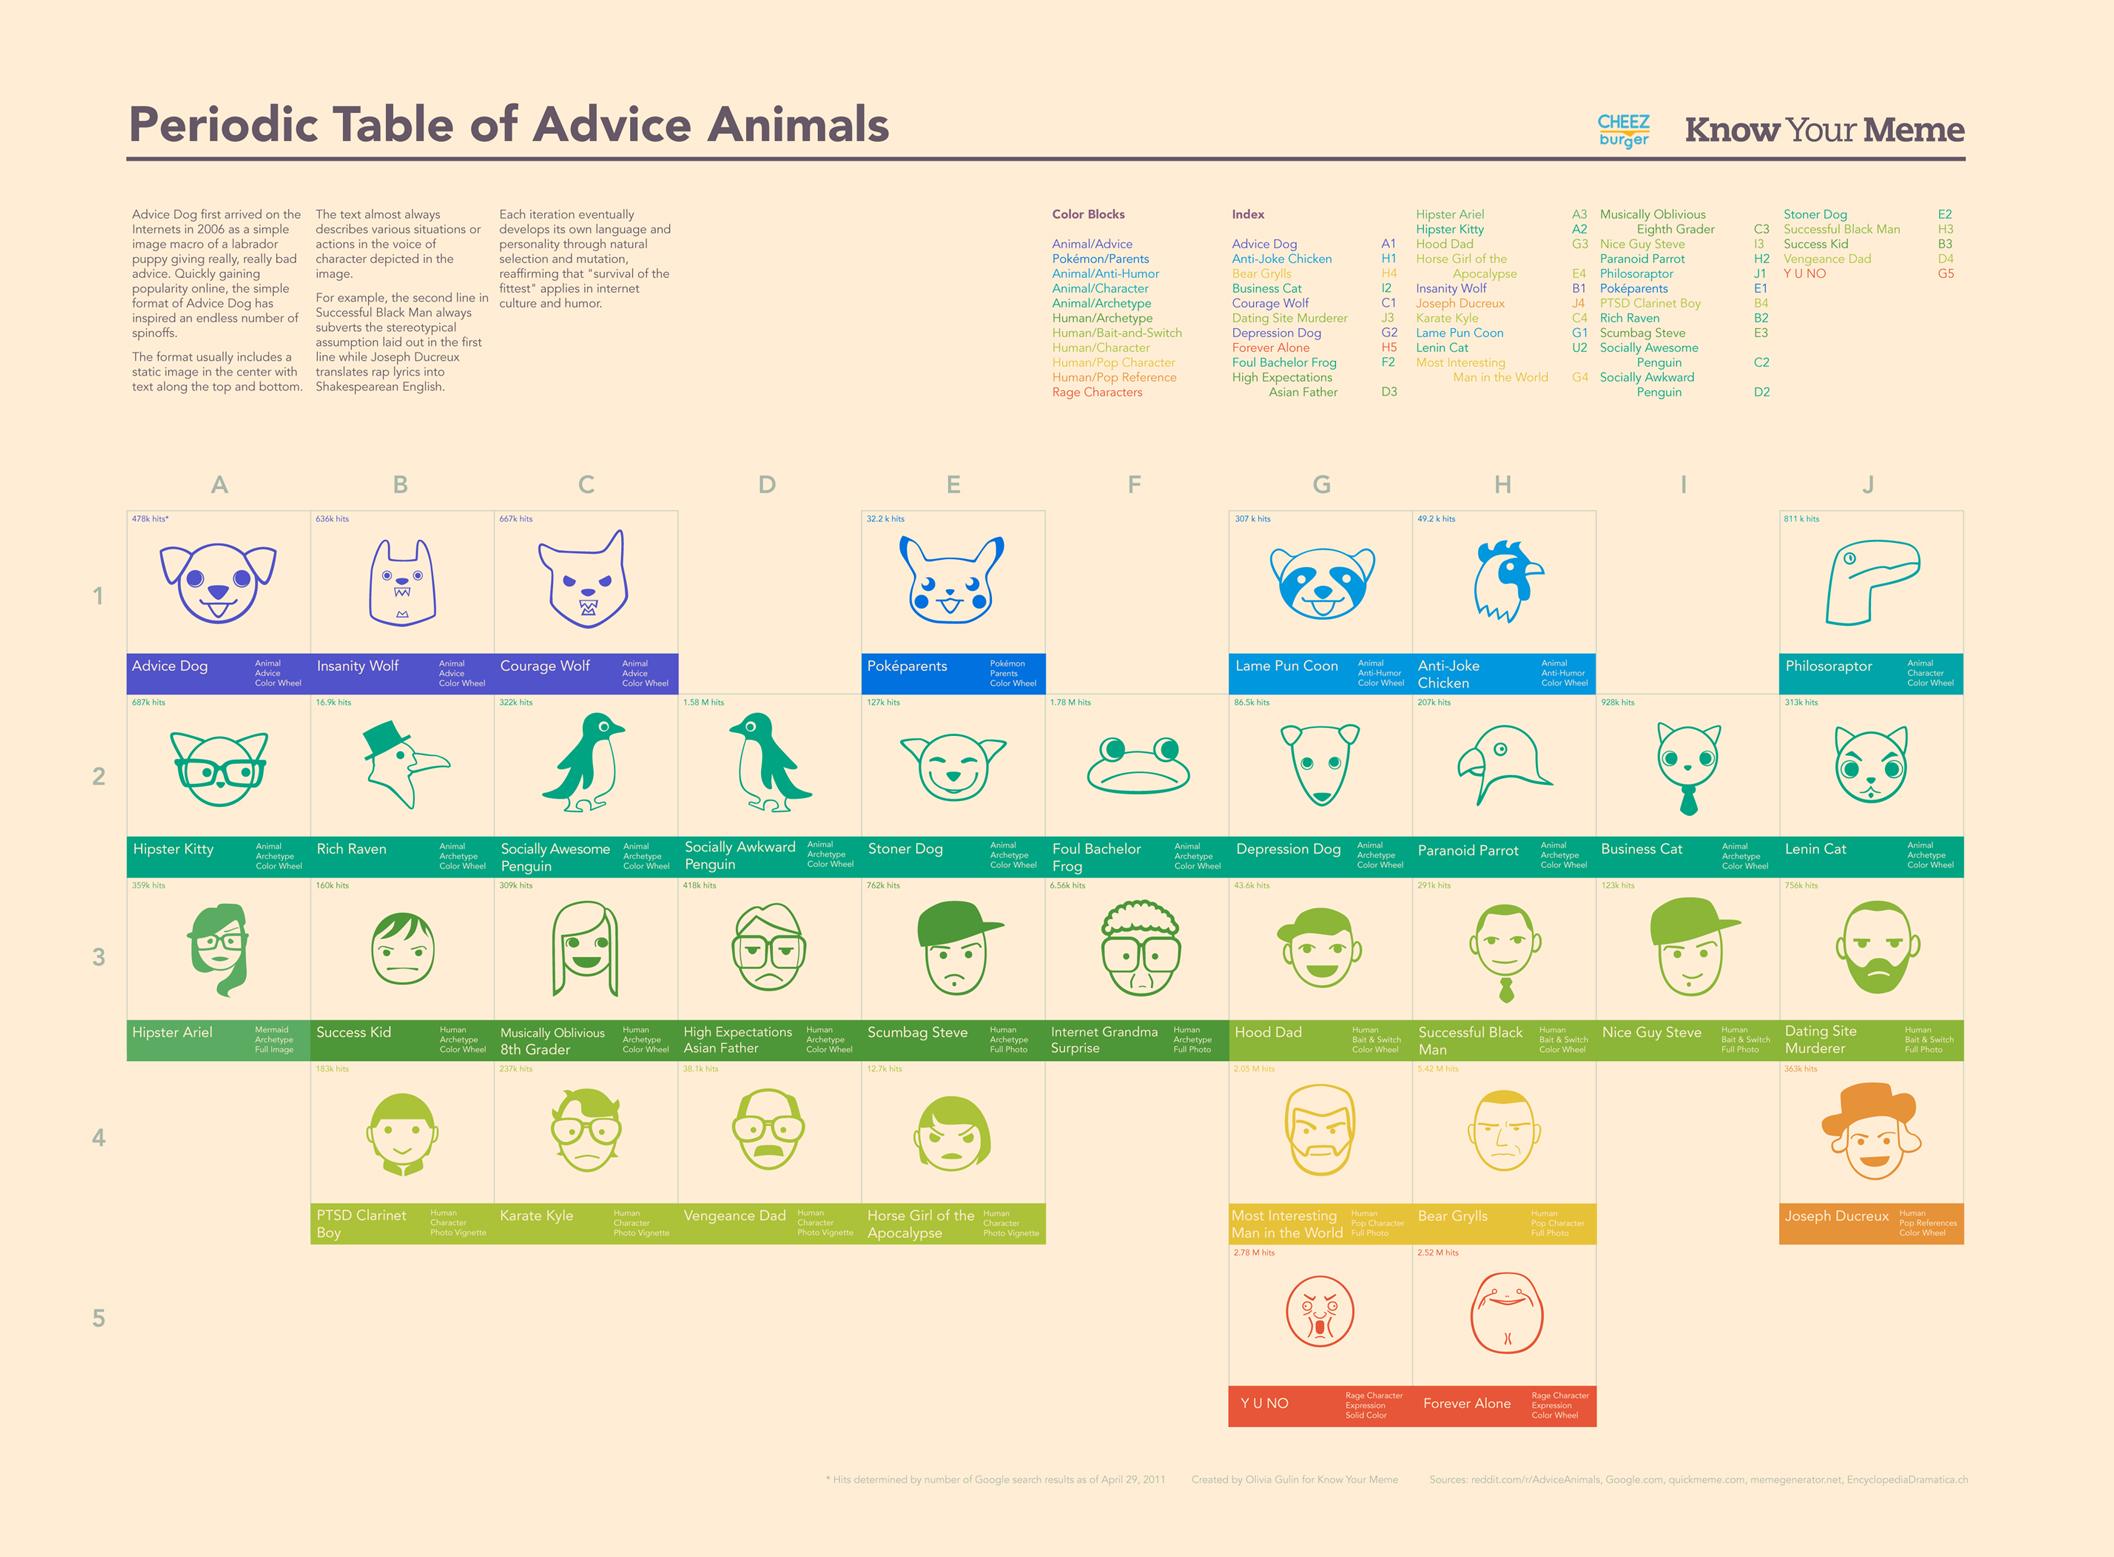 Periodic table of advice animal